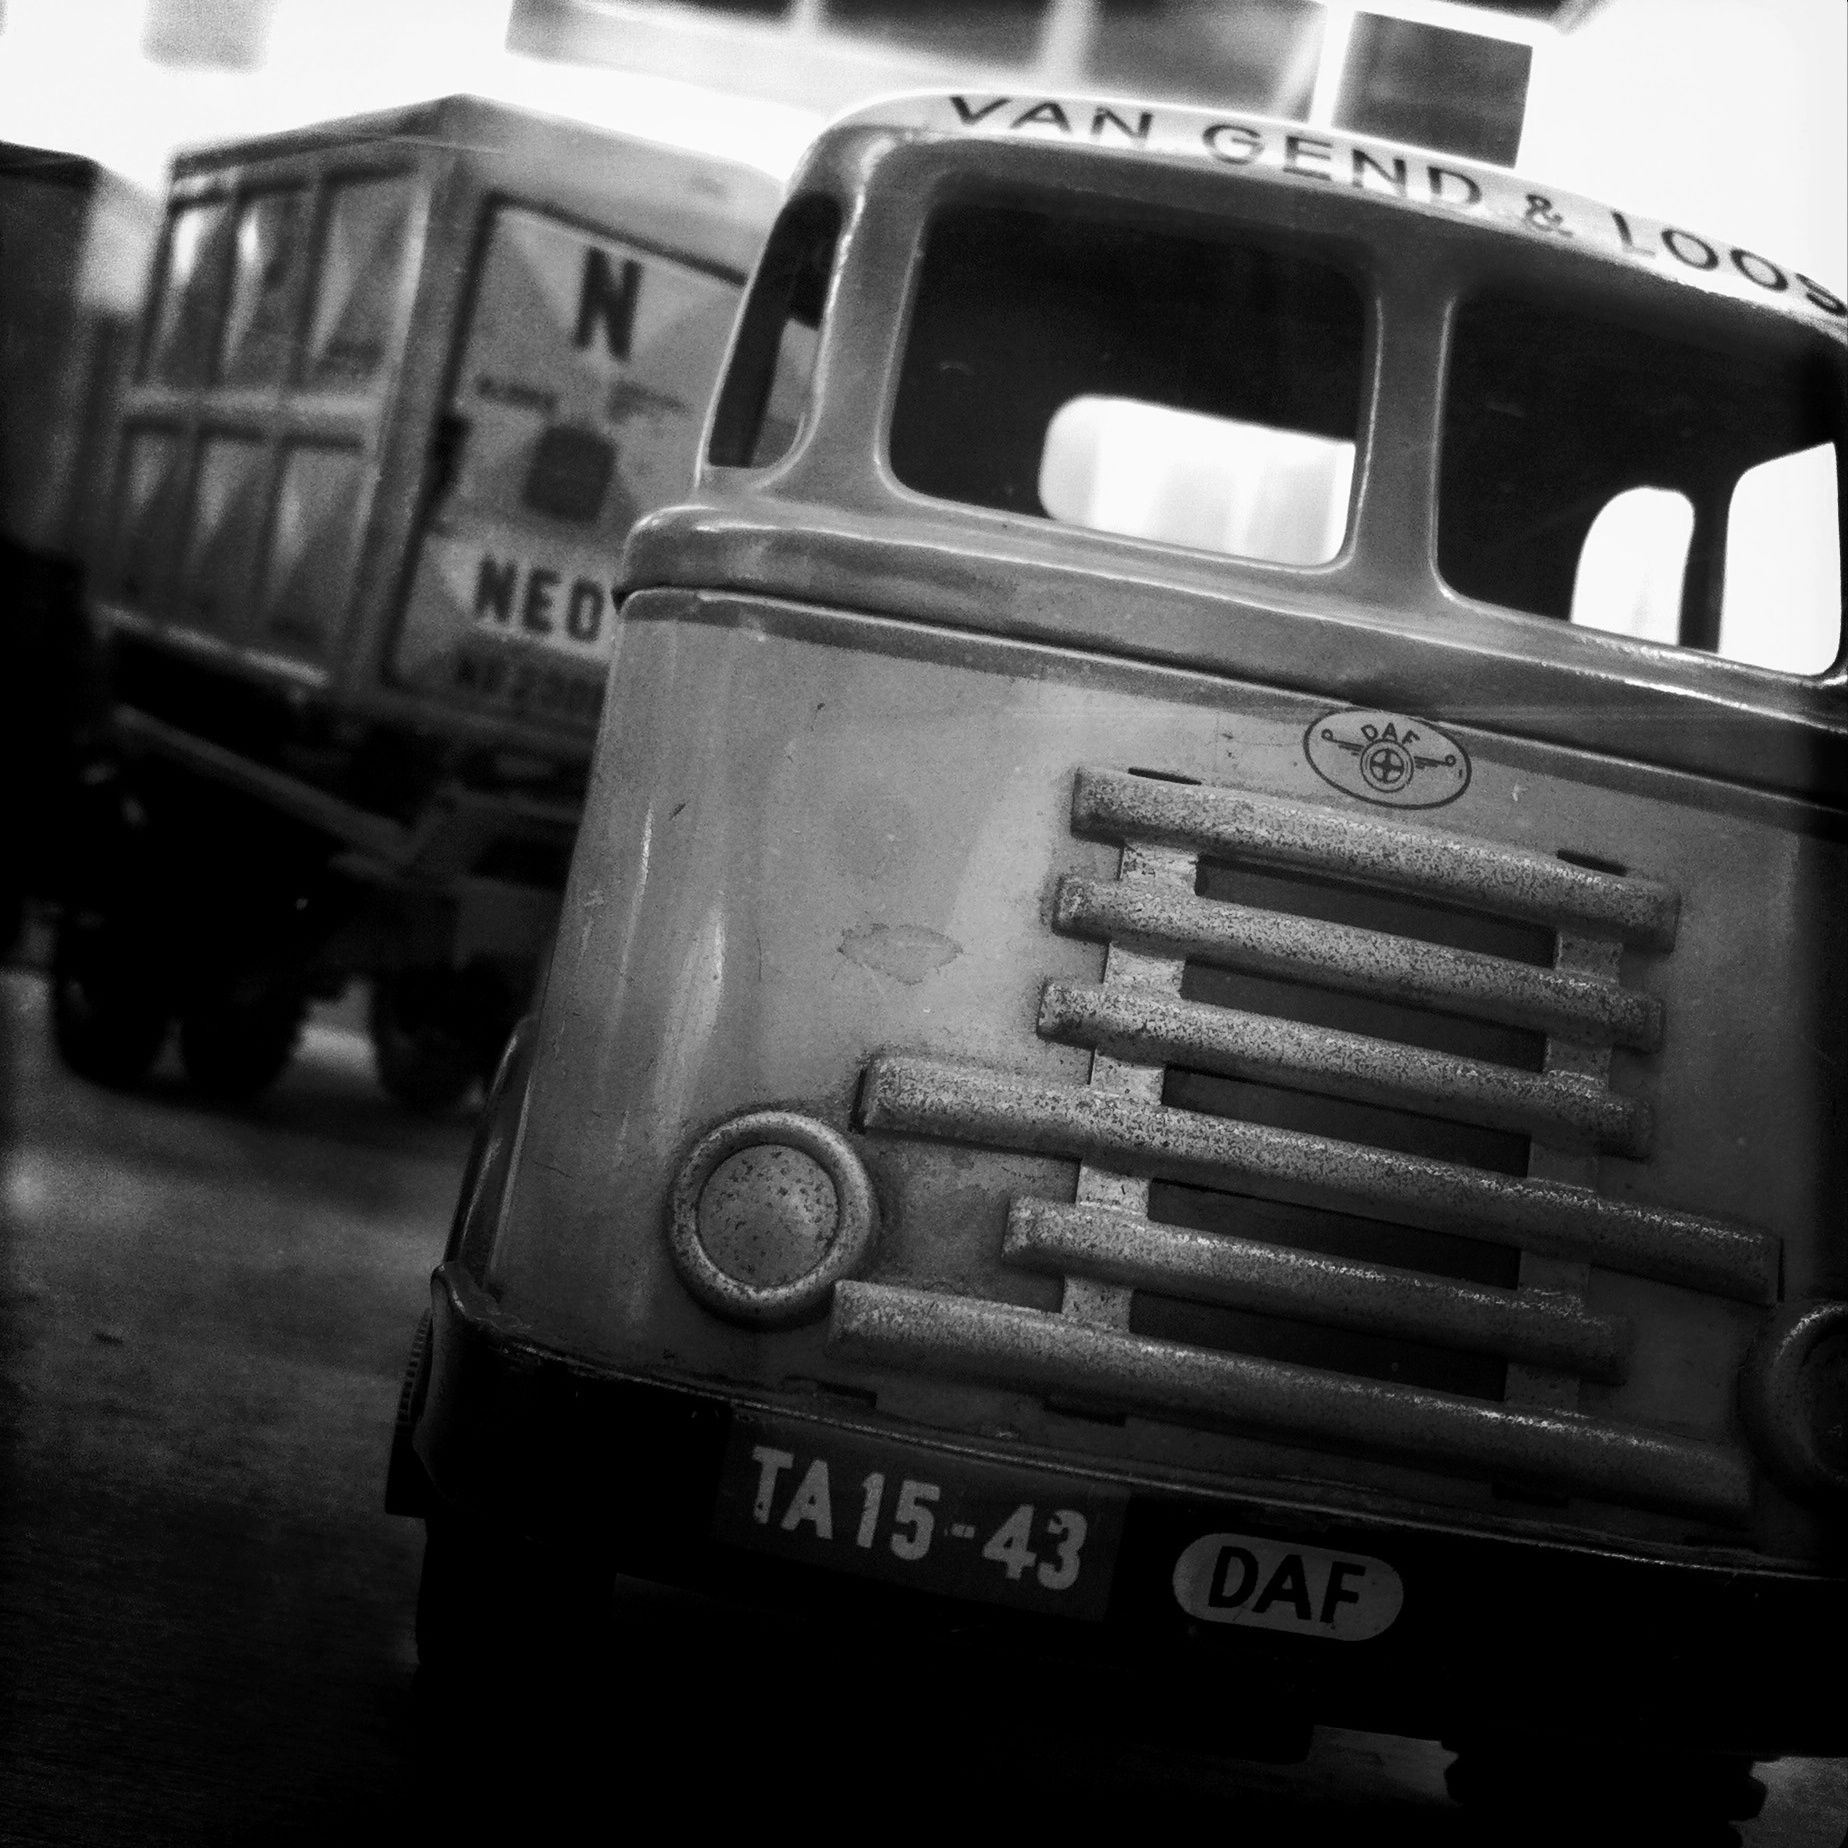 Classic modelcar